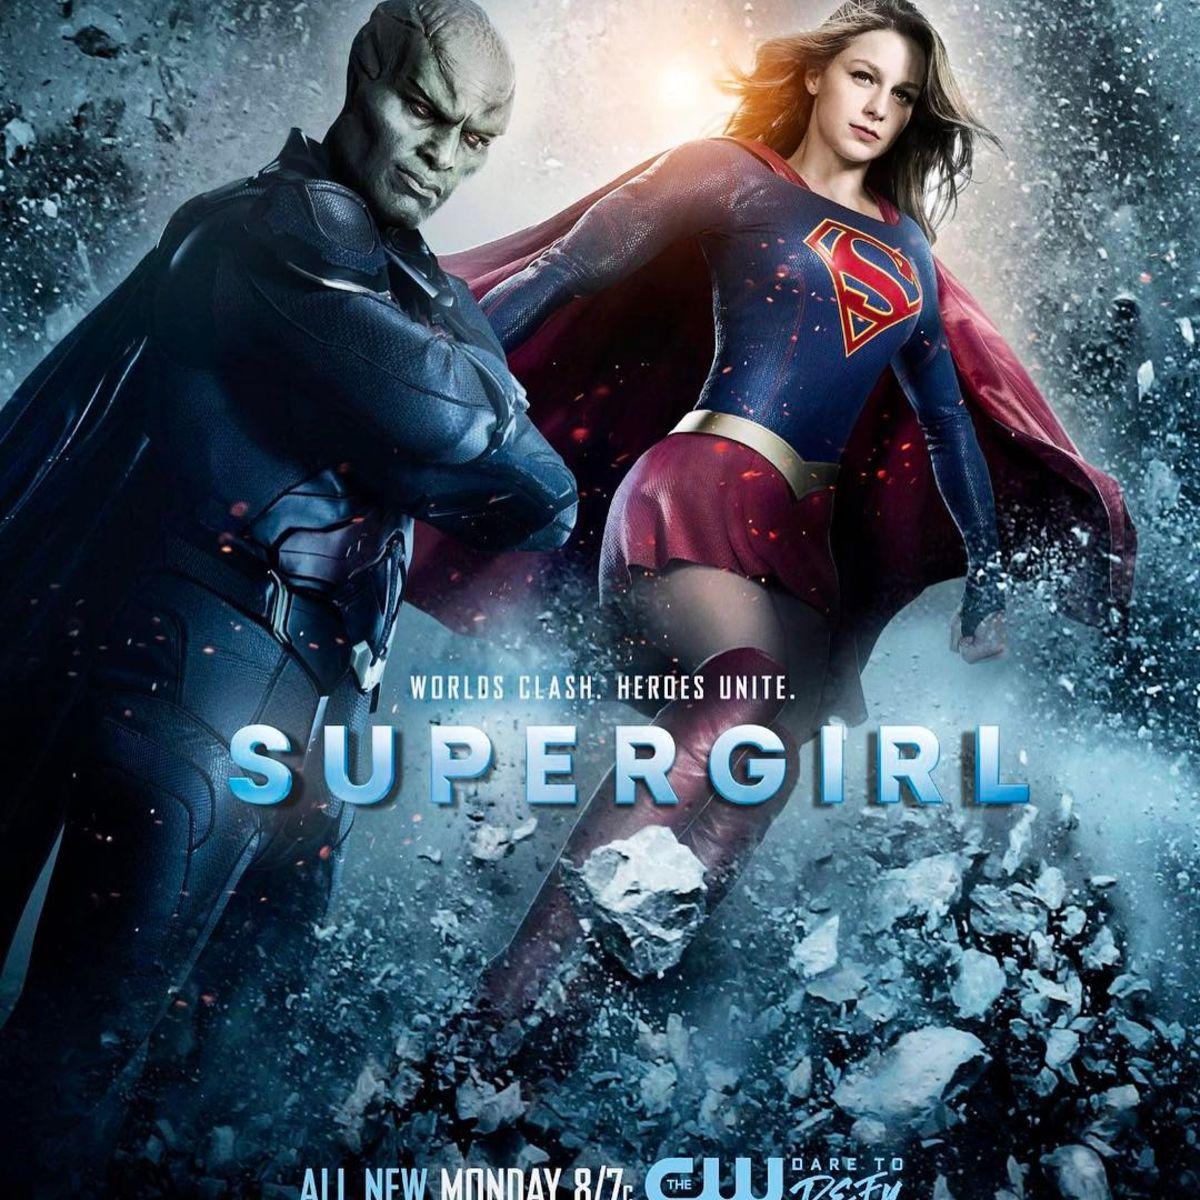 Supergirl-Martian-Manhunter-The-Martian-Chronicles.jpg